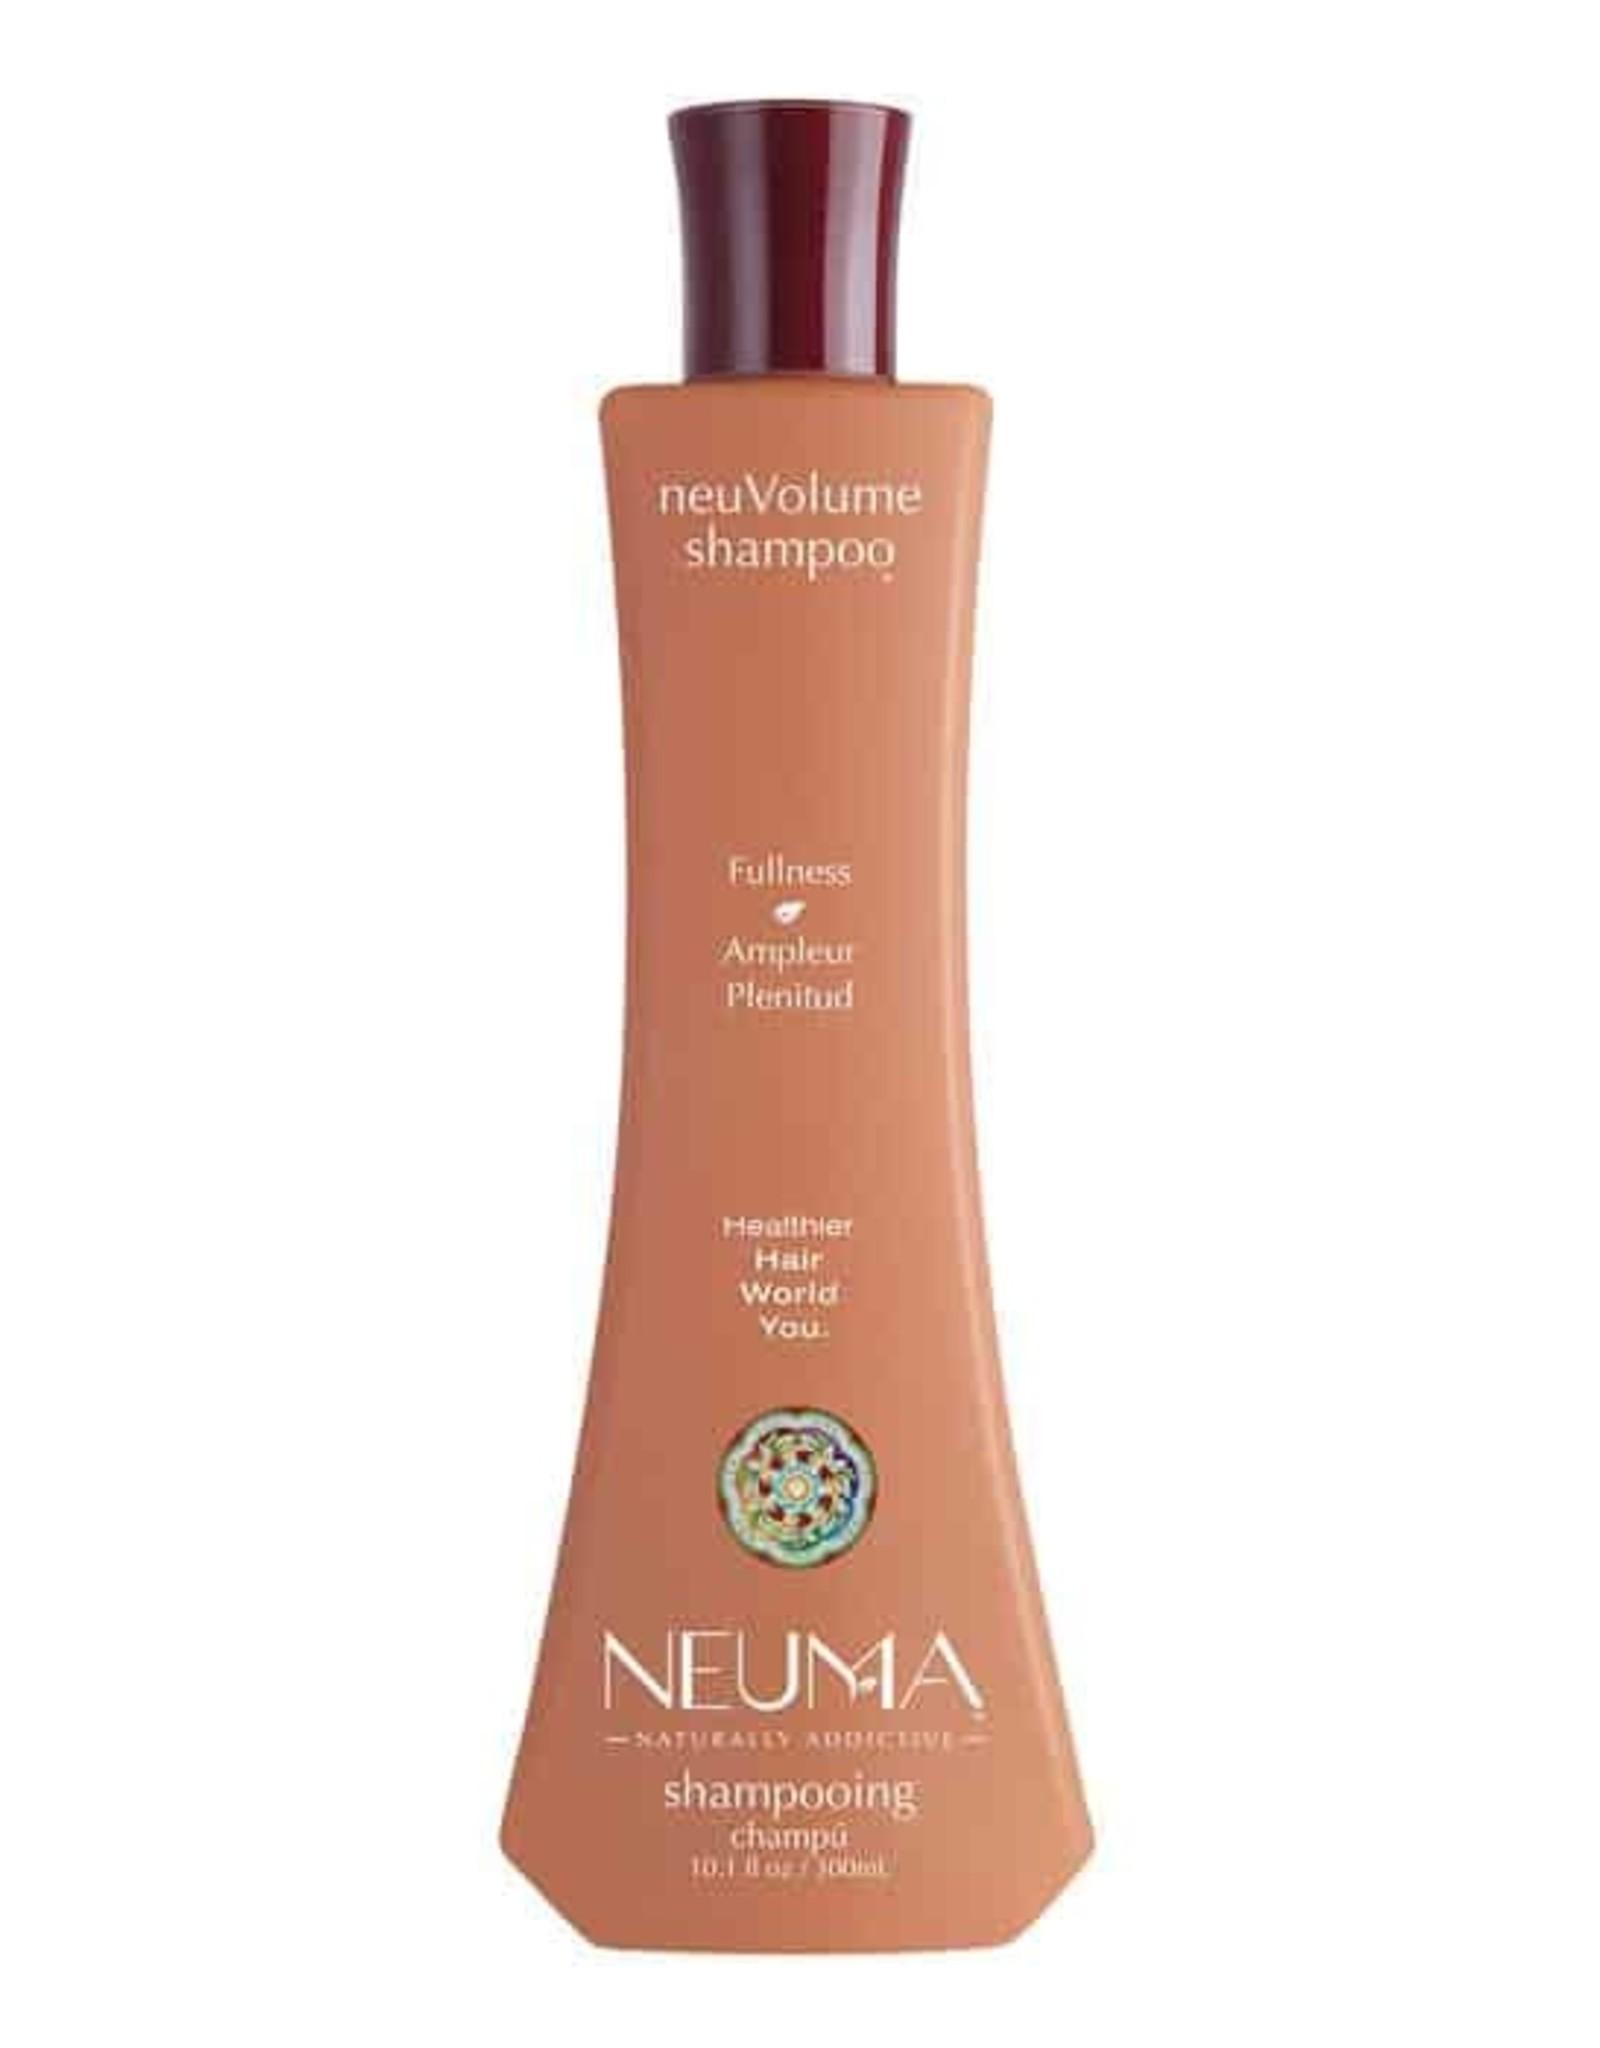 Neuma neuVolume Shampoo